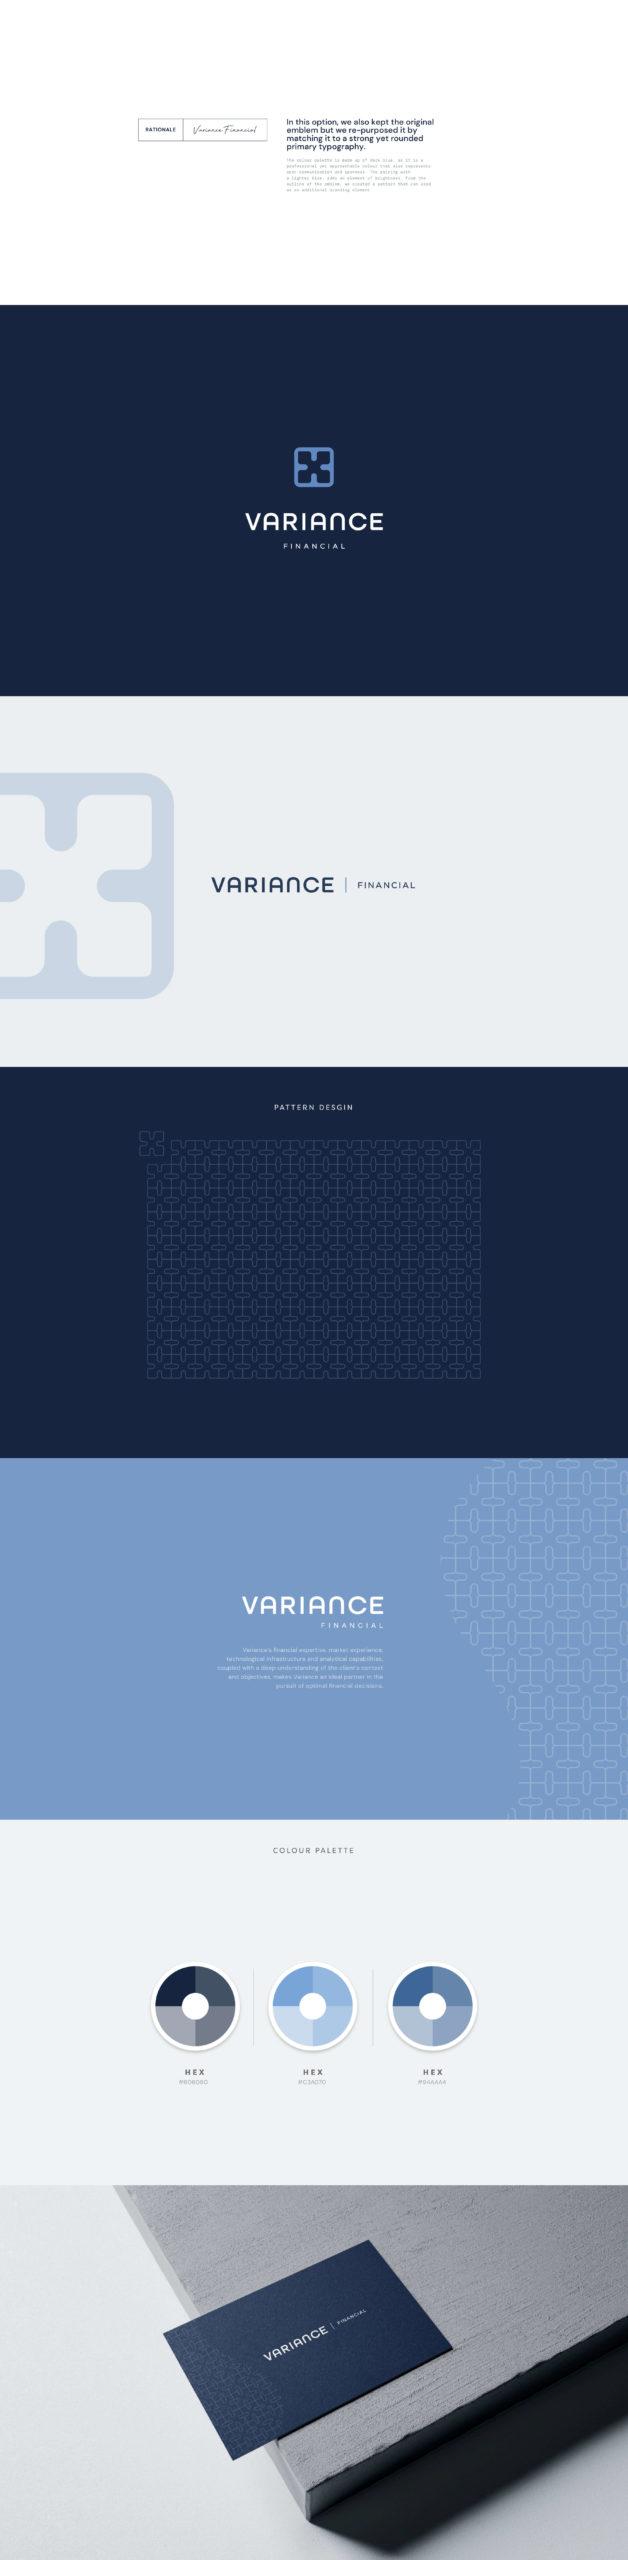 Digies-Good Intentions Studio-Rebranding-Variance Financial (1)